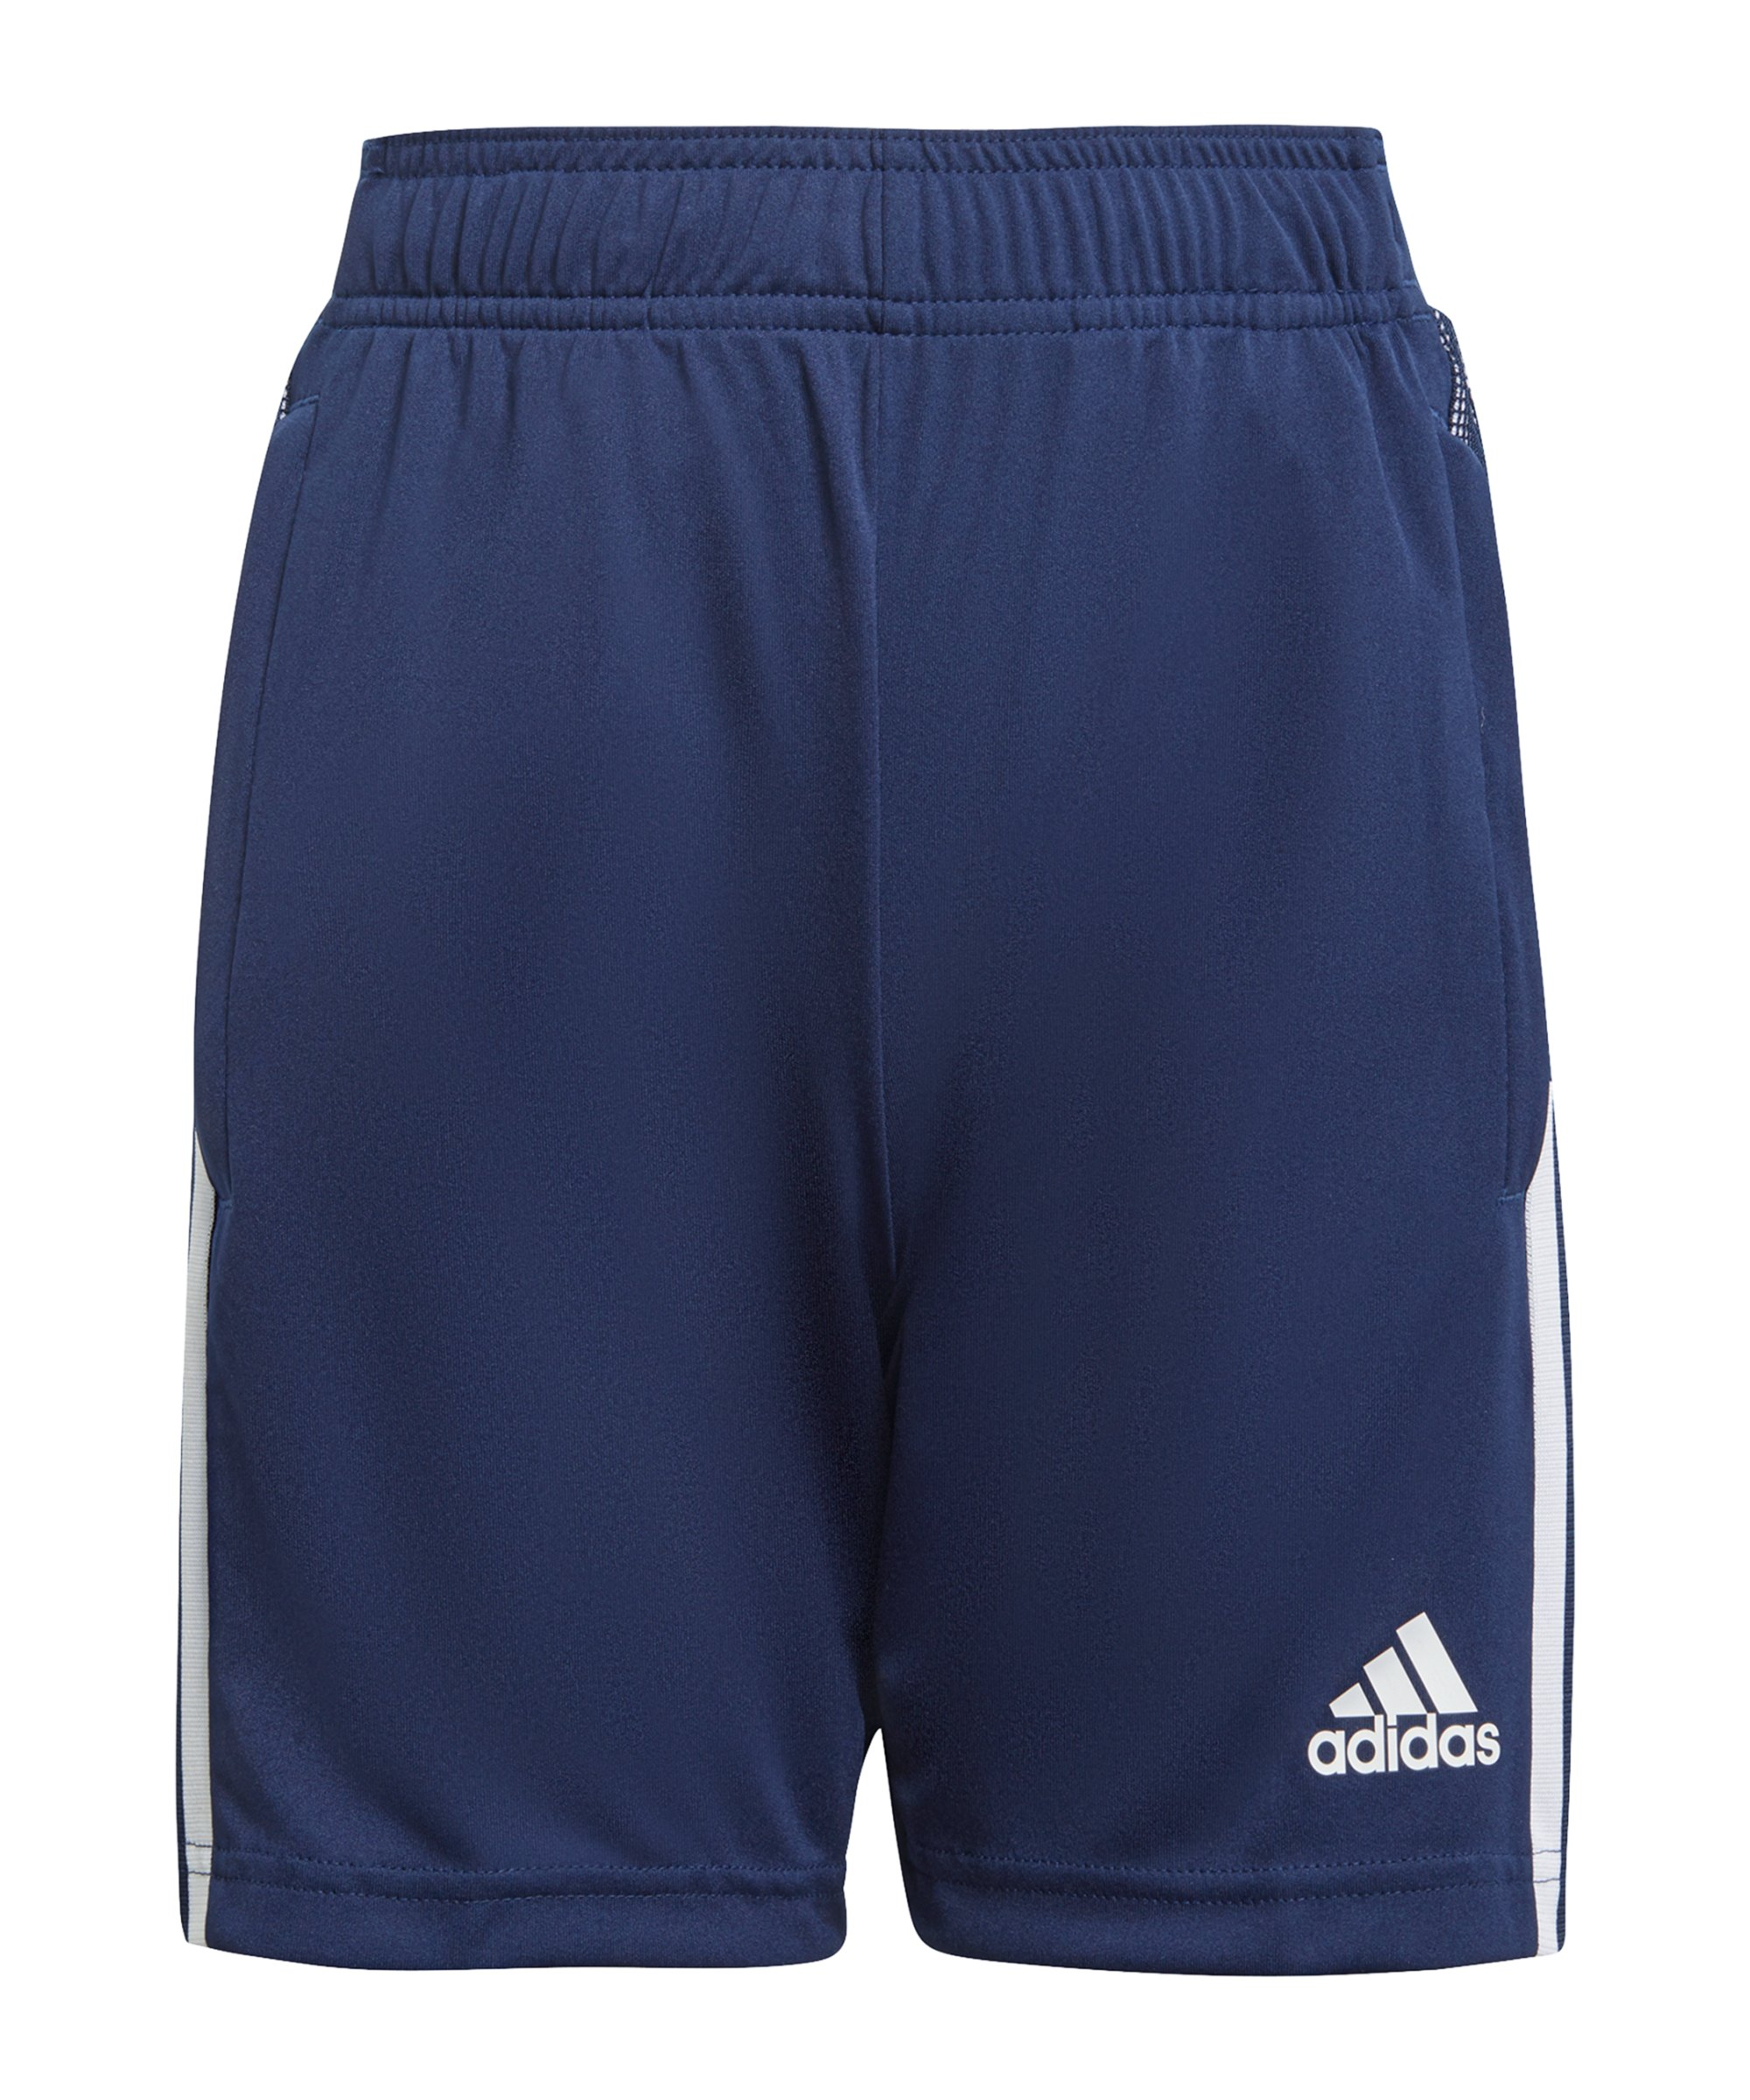 adidas Tiro 21 Shorts Kids Blau - blau